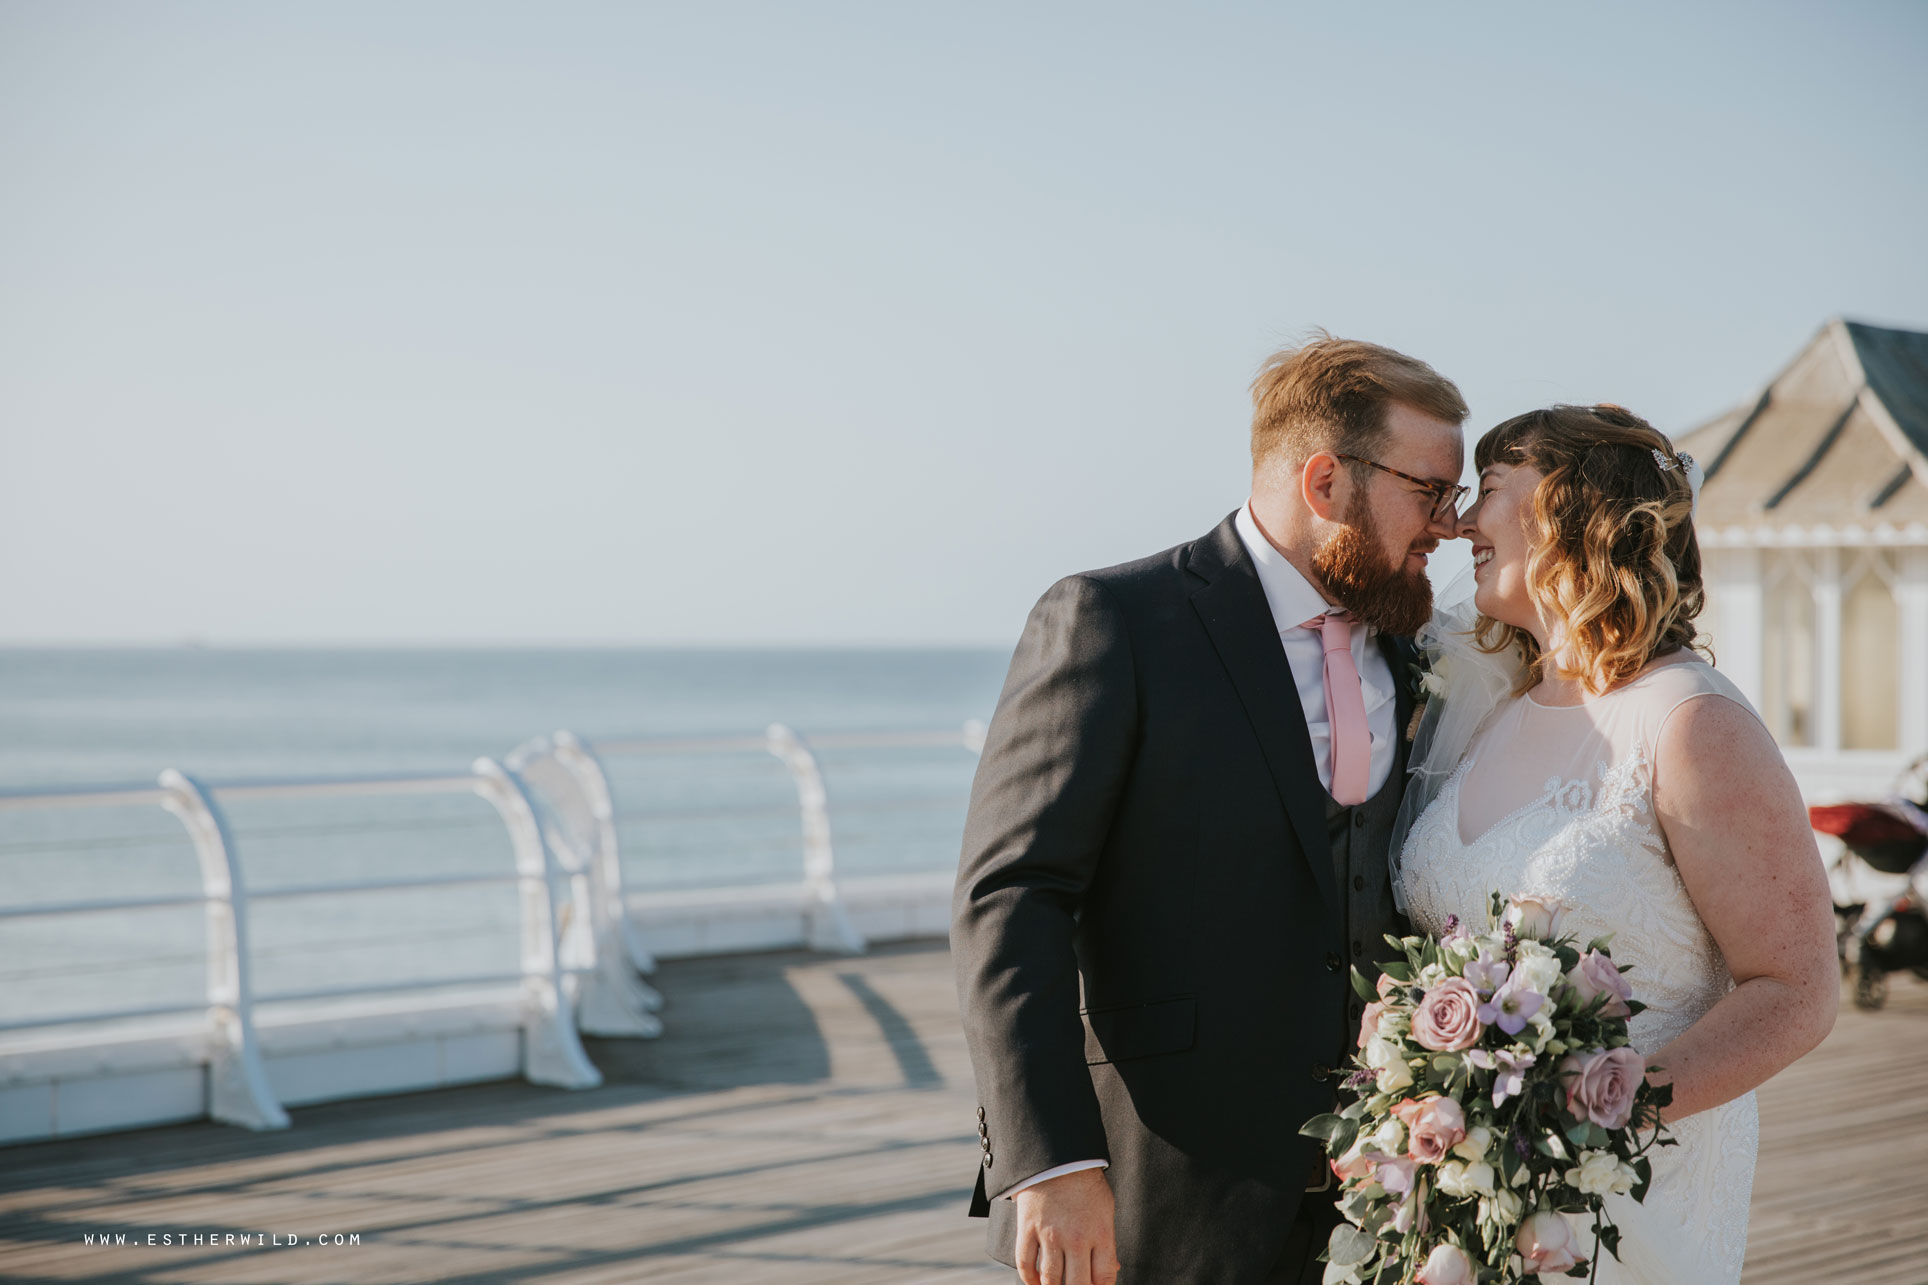 Cromer_Wedding_Beach_Outdoor_Ceremony_Norfolk_North_Lodge_Registry_Office_Rocket_House_Cafe_Cromer_Pier_IMG_4616.jpg